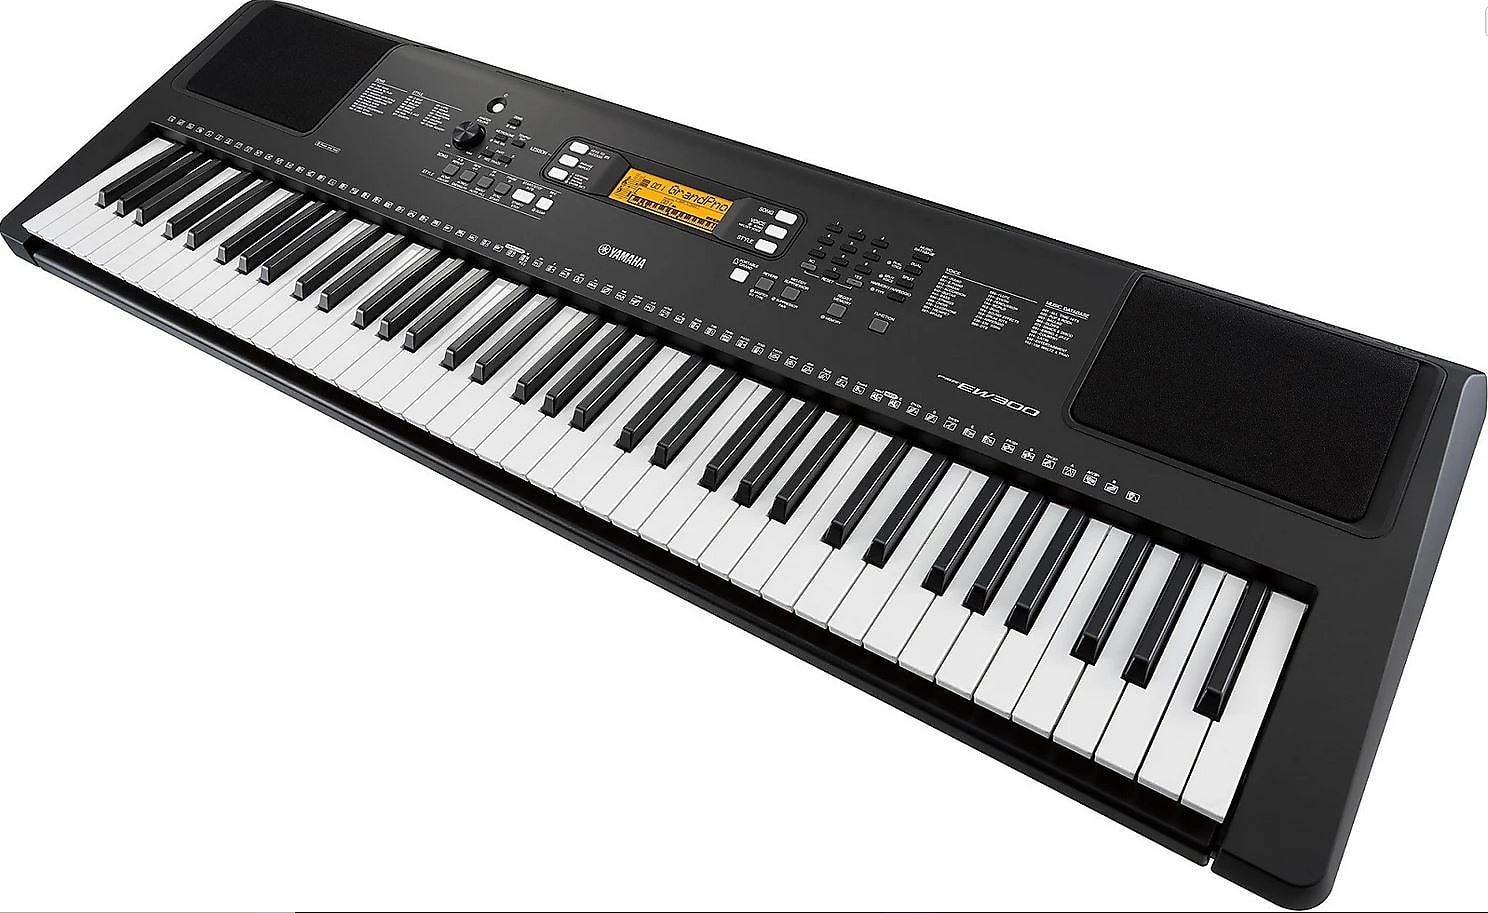 Yamaha PSR-EW300 76-key Portable Arranger Keyboard with Survival Kit